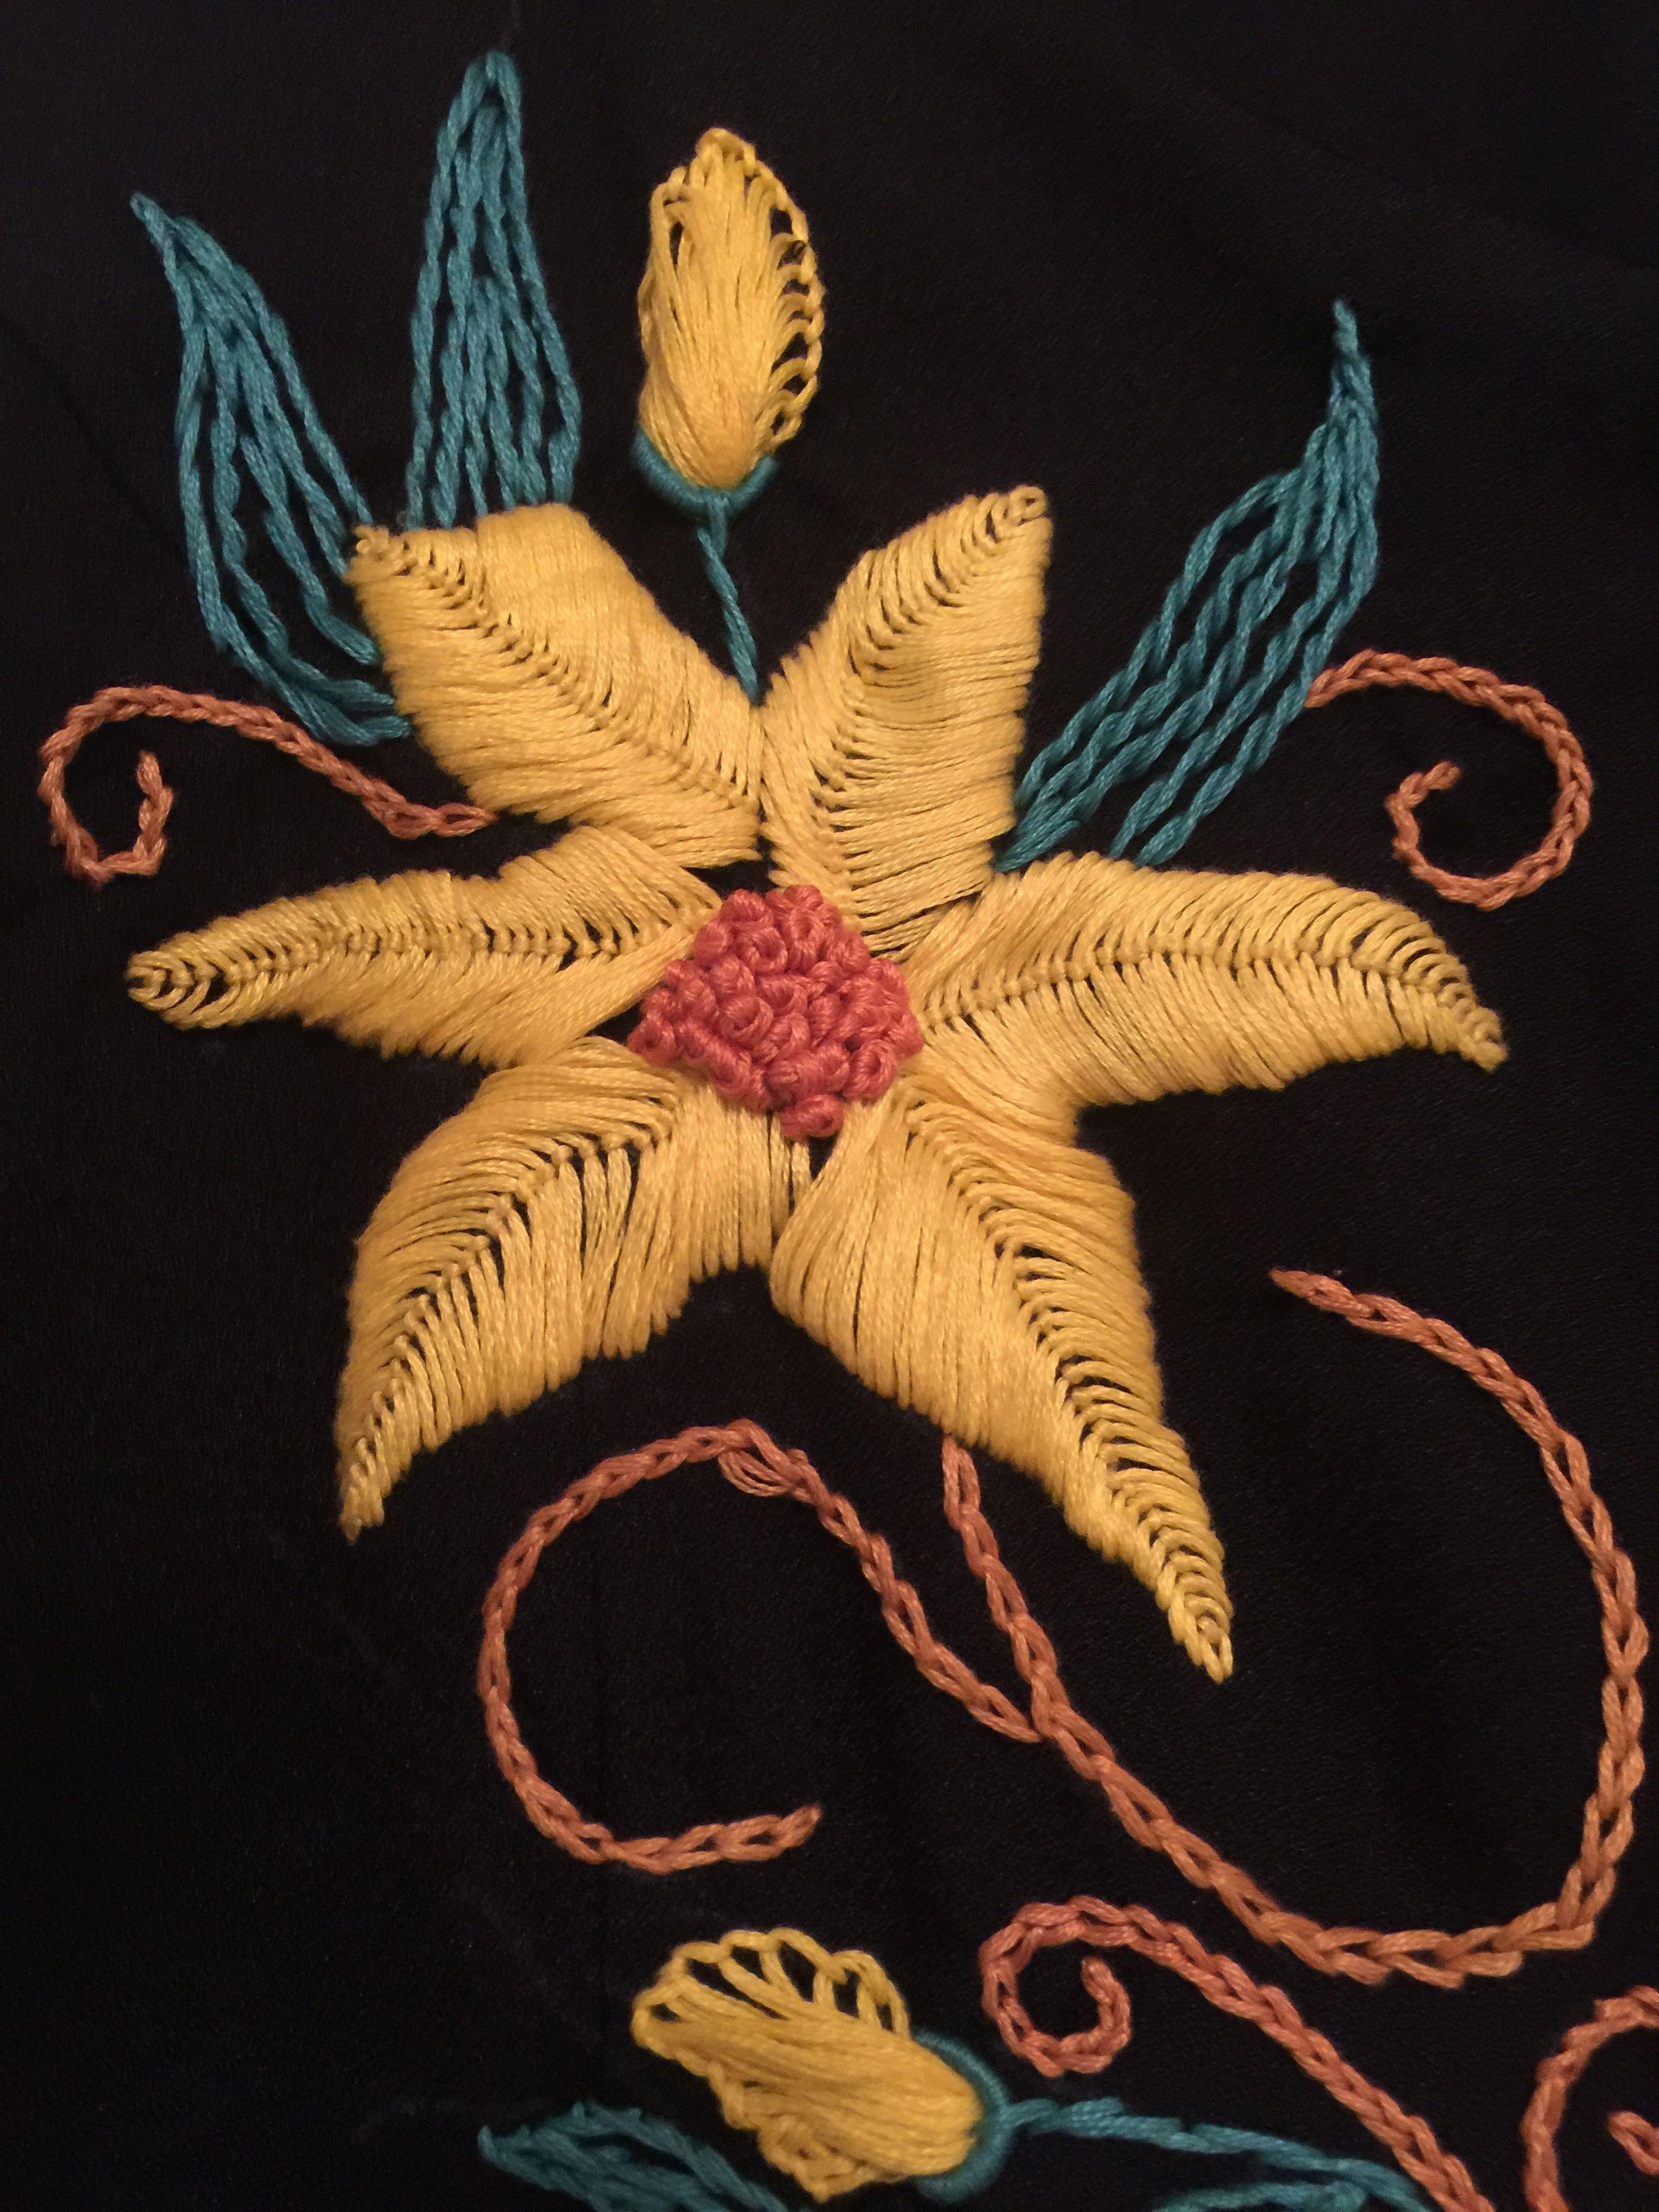 Pin de Lacy Bockhoff en fibers   Pinterest   Bordado